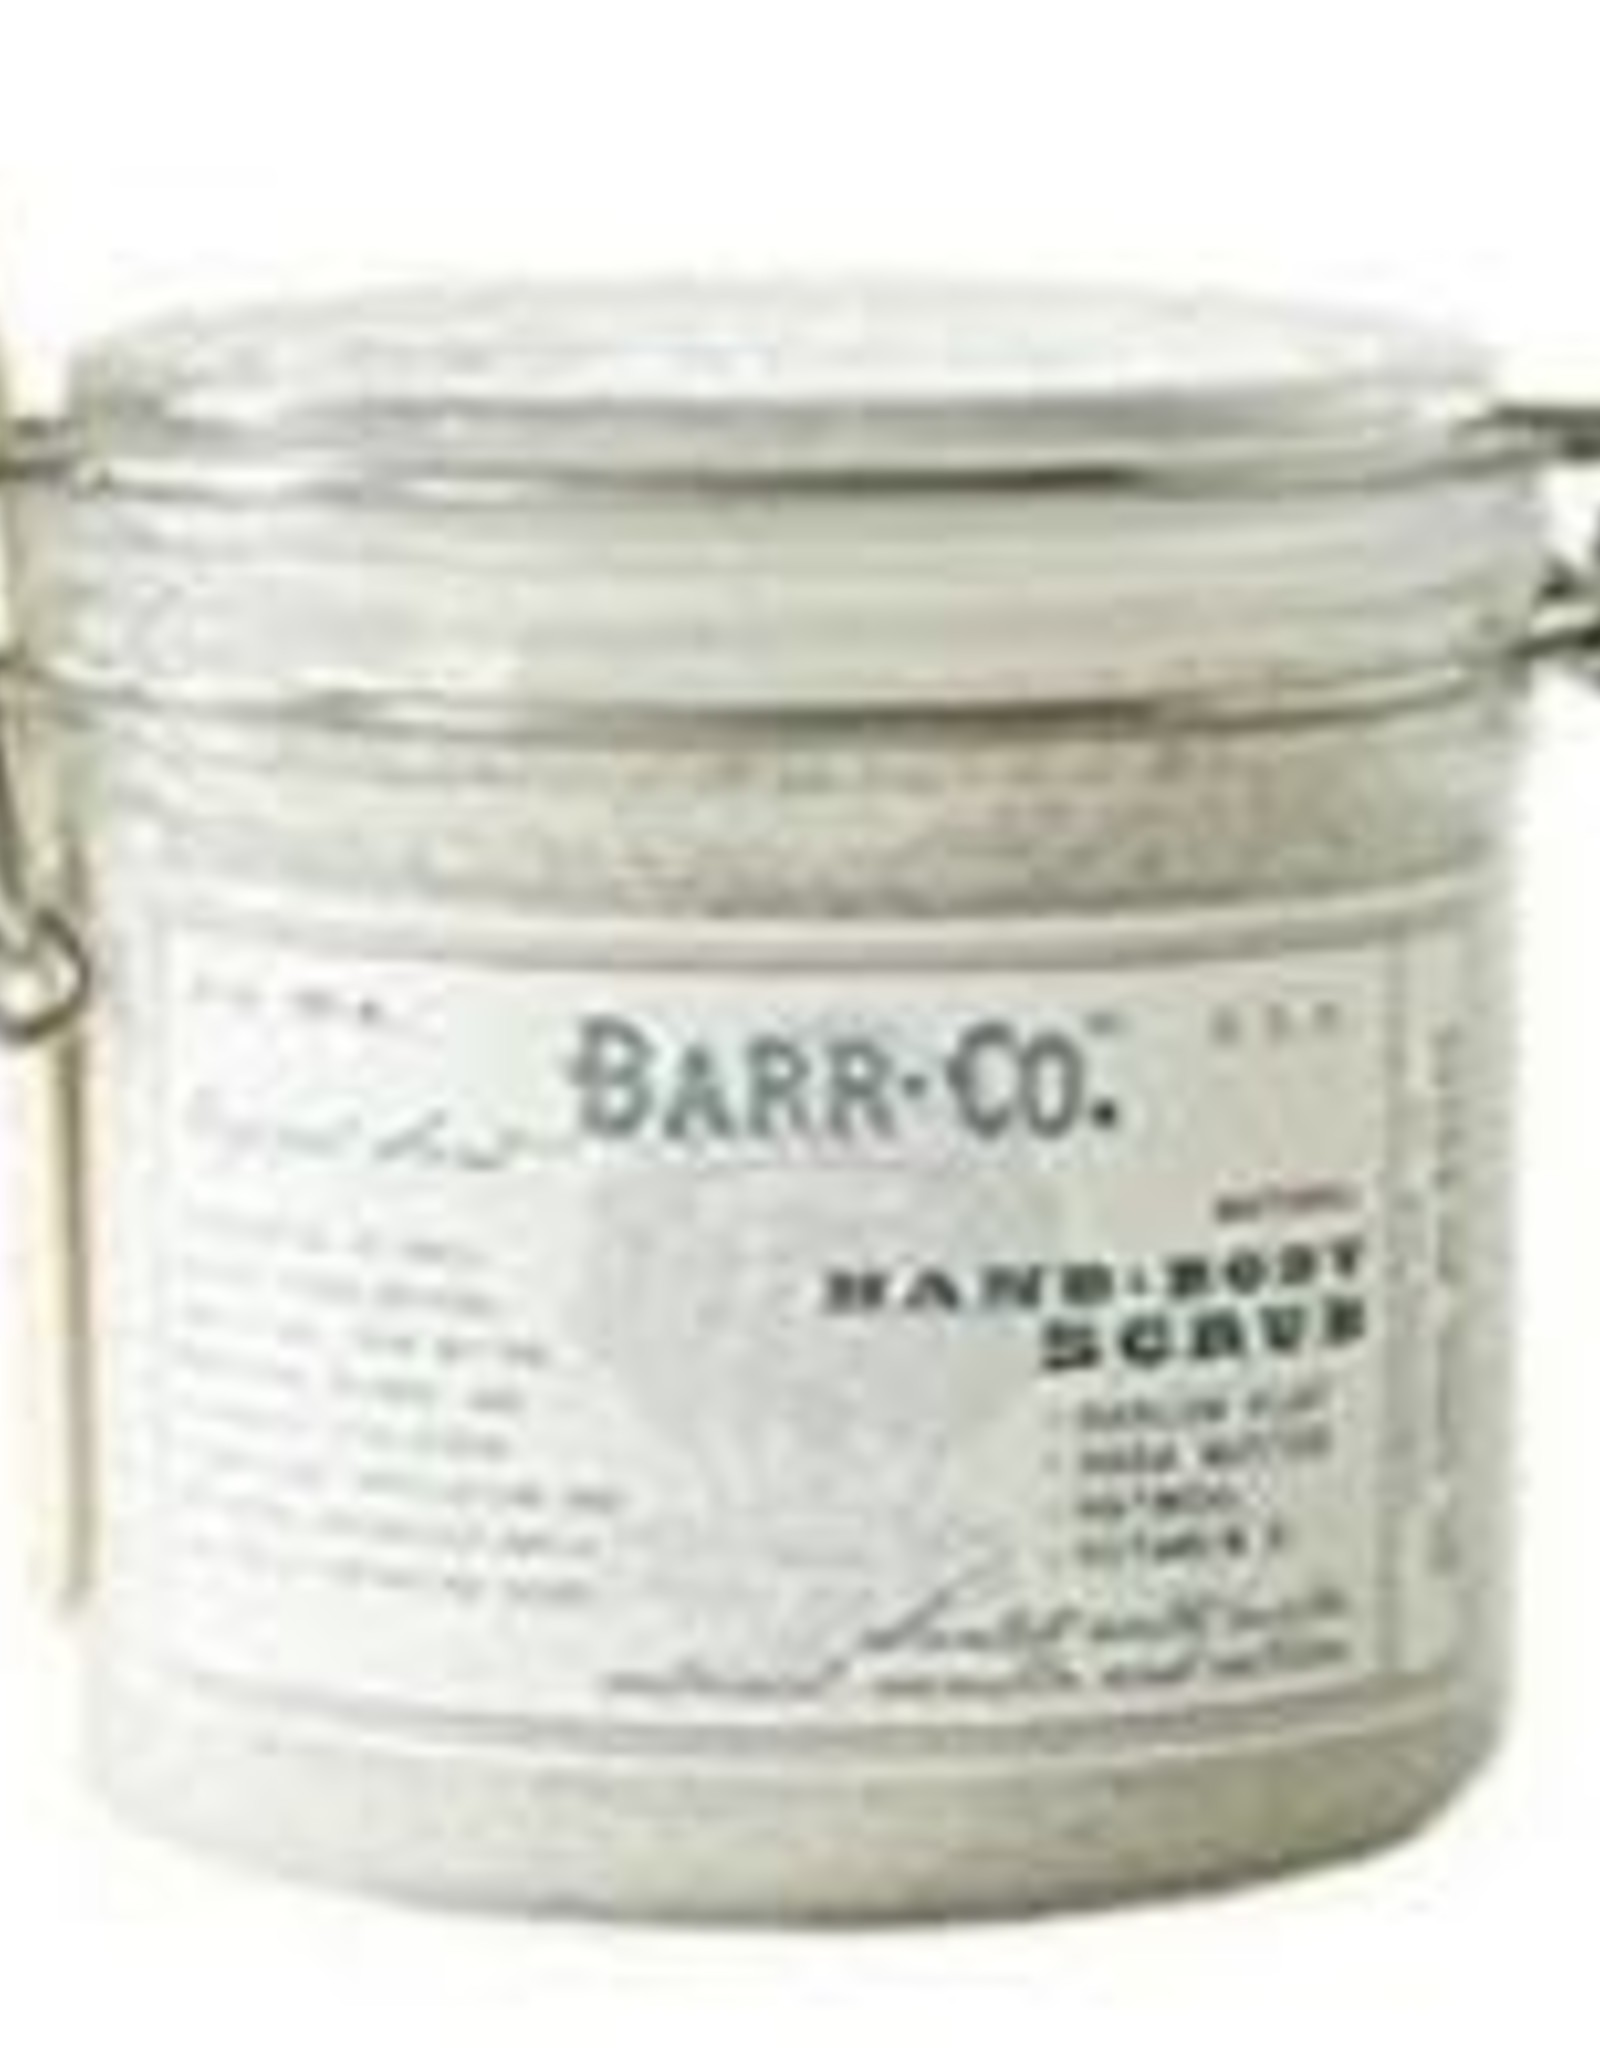 Barr-Co. Barr-Co. 12oz Clay Scrub Original Scent